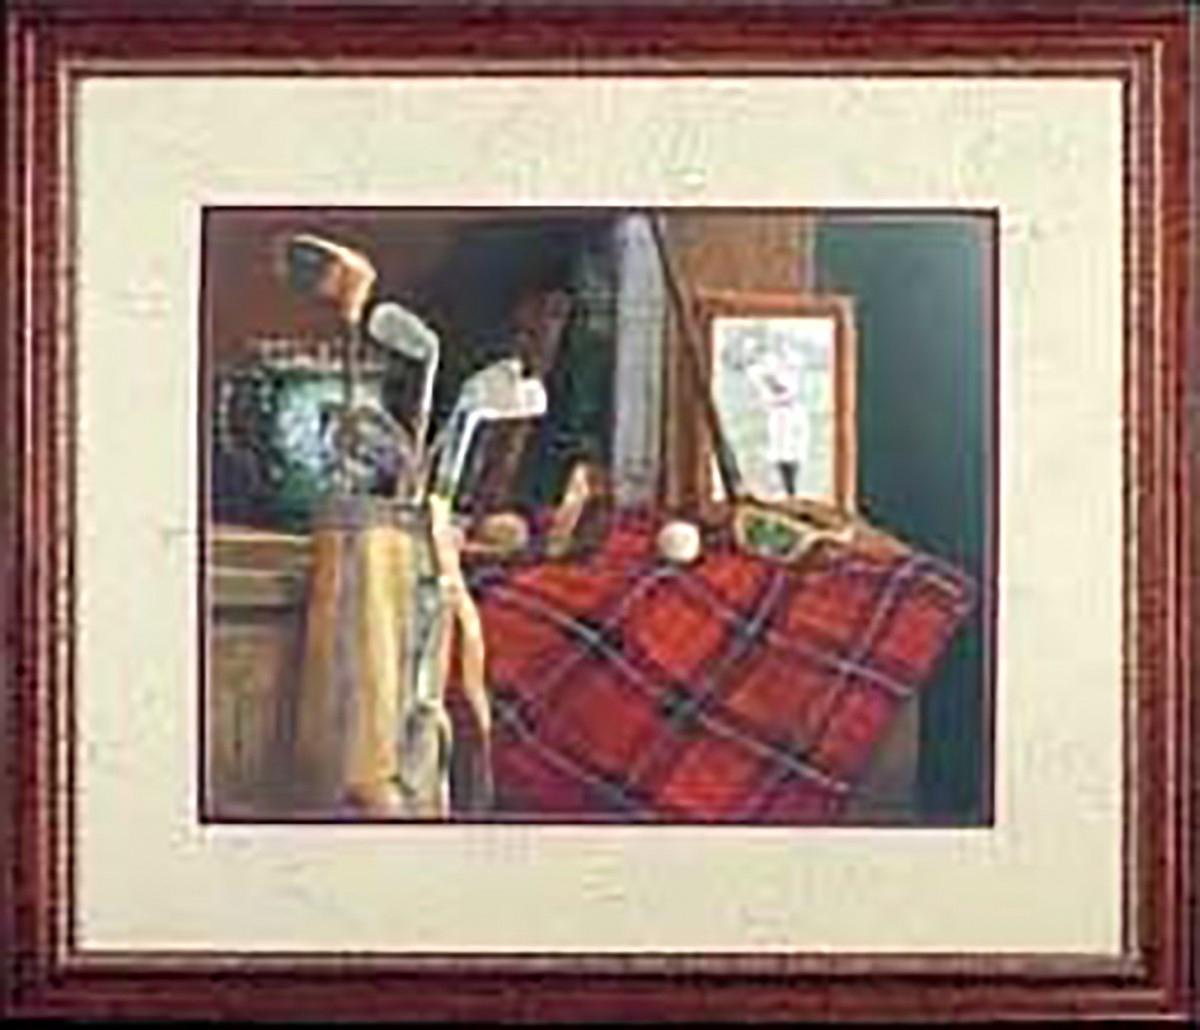 Wall Art Old Friends Golf Print Framed 30 x 24 Wall Prints Framed Art Decoratvie Framed Art